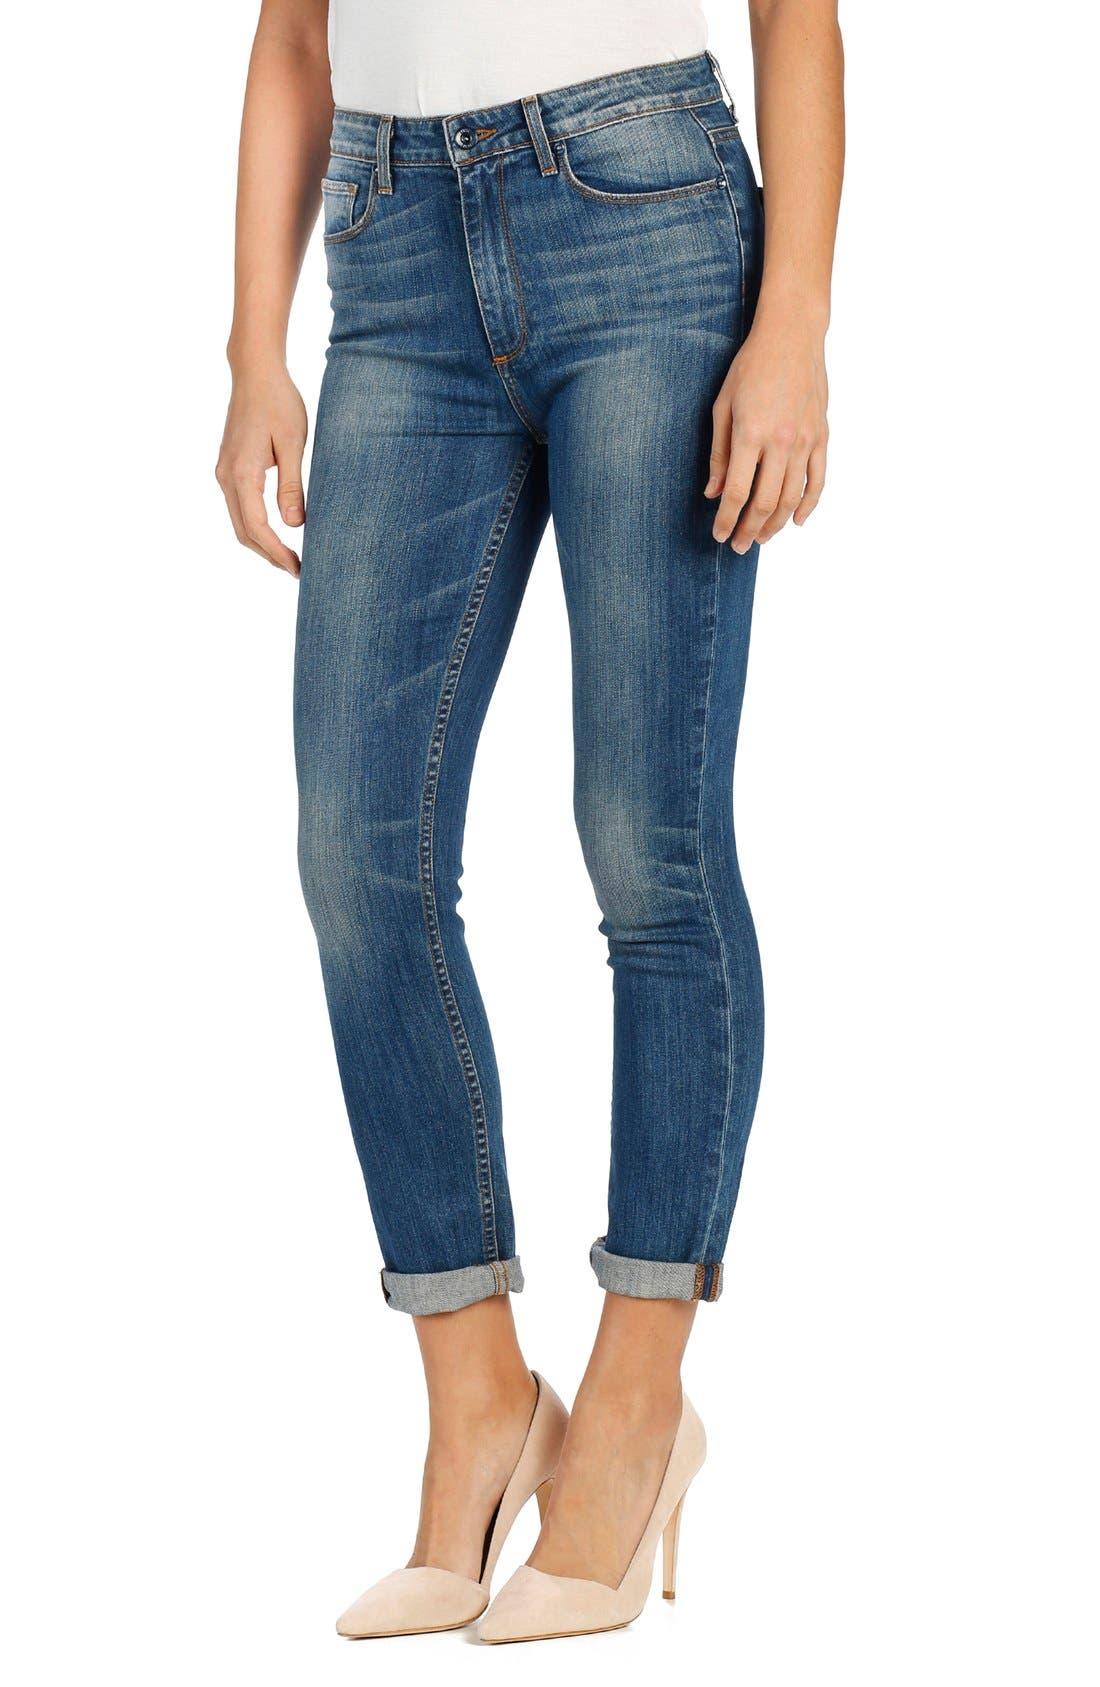 Main Image - PAIGE 'Carter' High Rise Crop Slim Jeans (Tallulah)